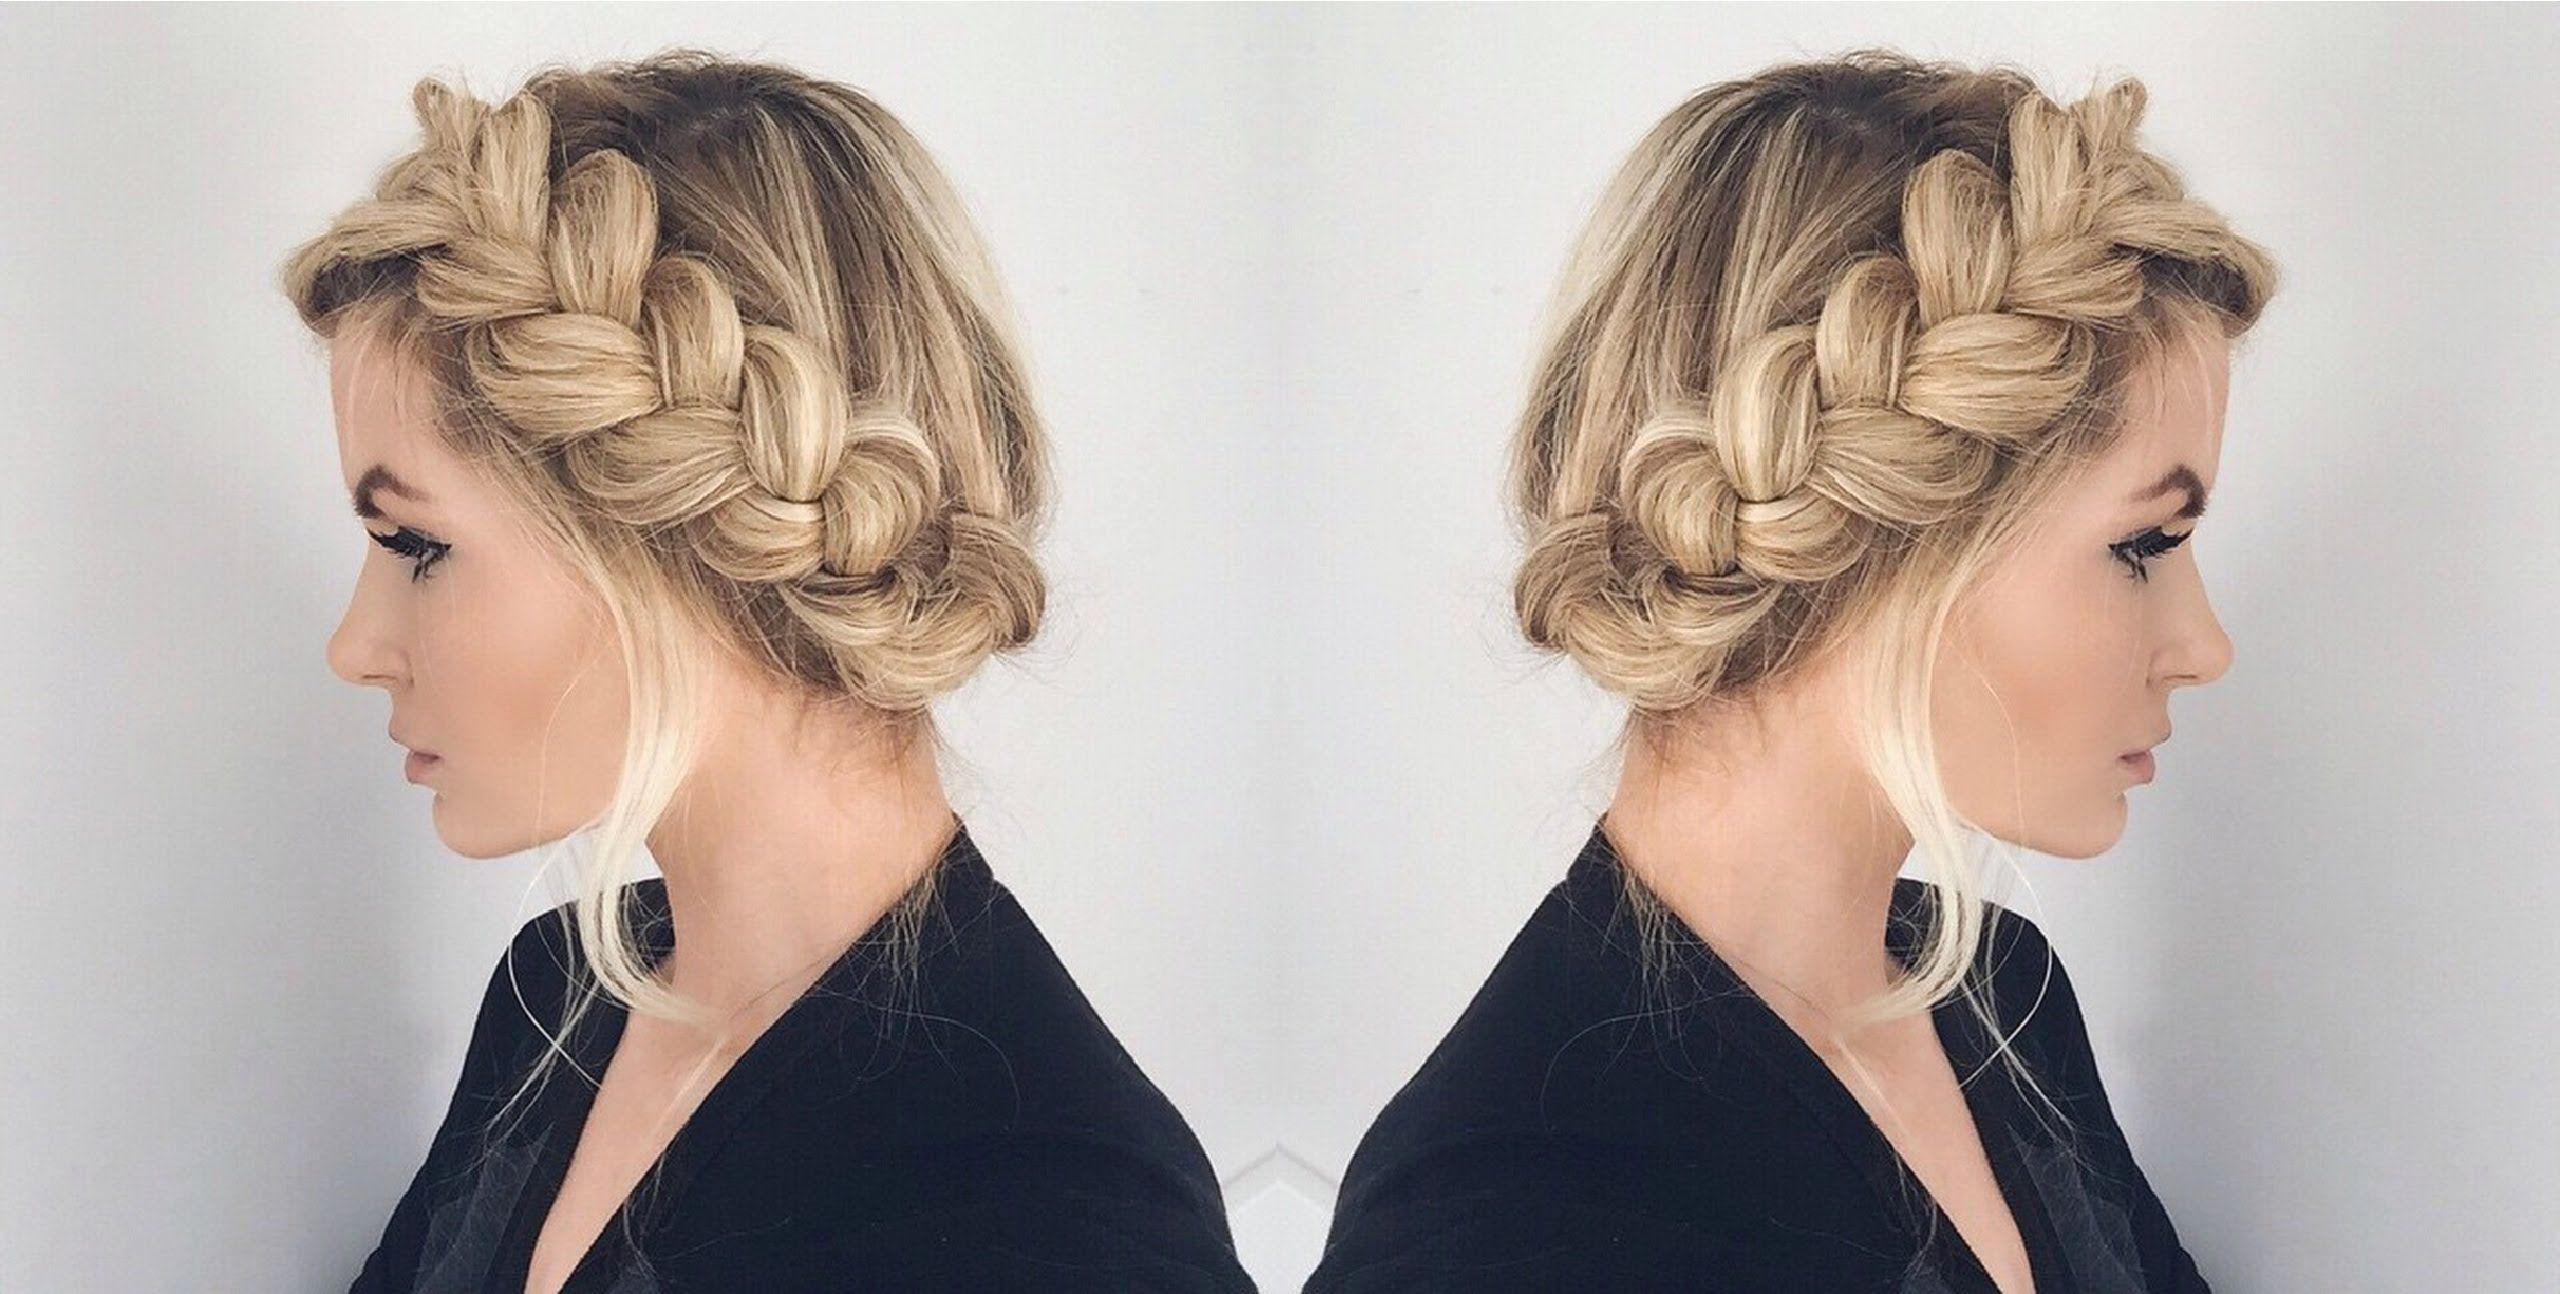 Tutorial halo braid tutorial hair inspiration pinterest halo